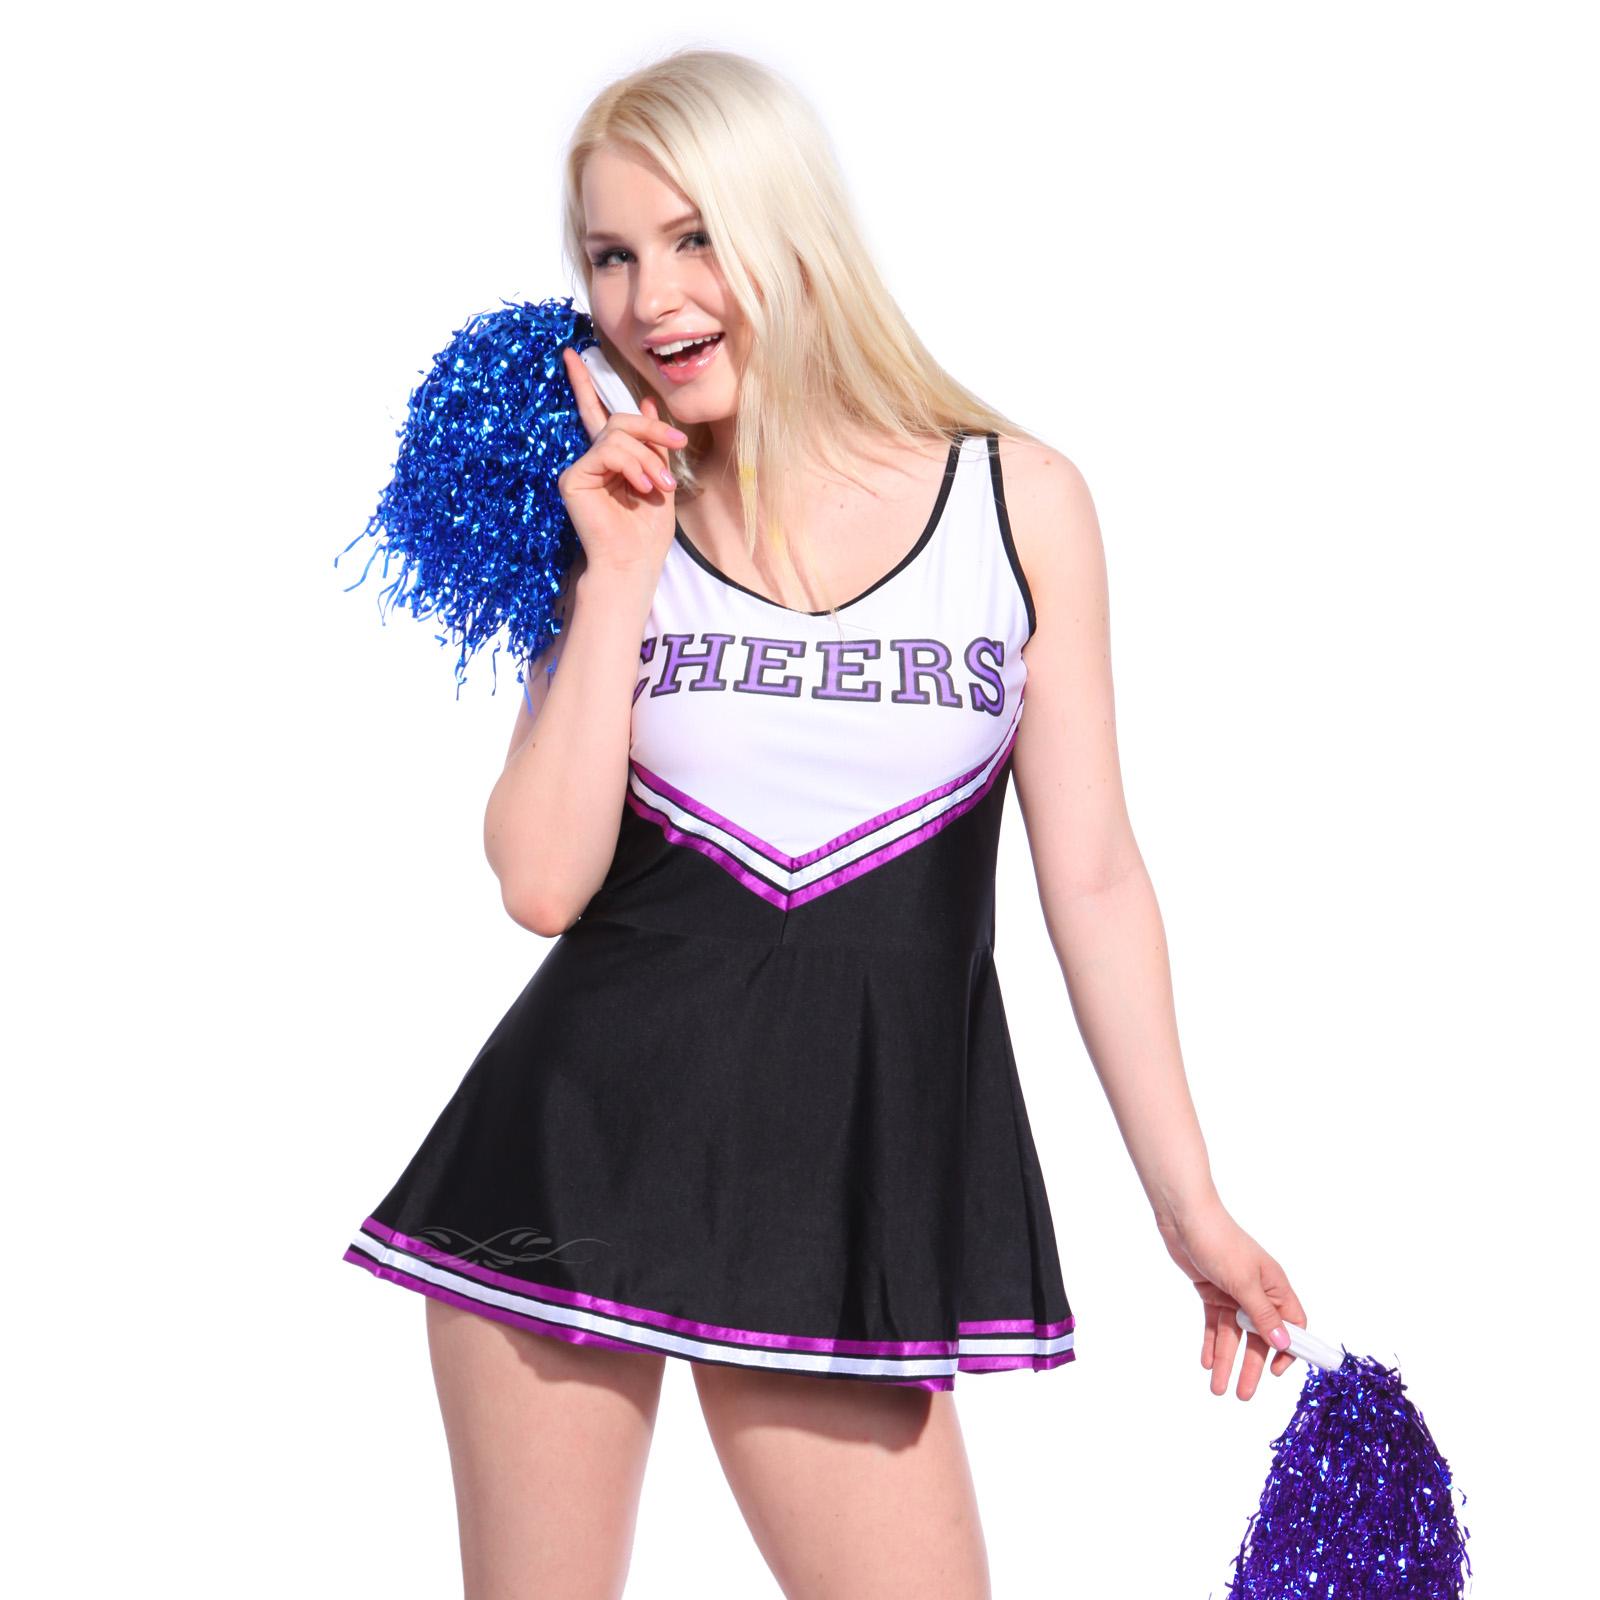 faschingskost m damen cheerleader kost m cheerleading uniform m dchen minirock ebay. Black Bedroom Furniture Sets. Home Design Ideas